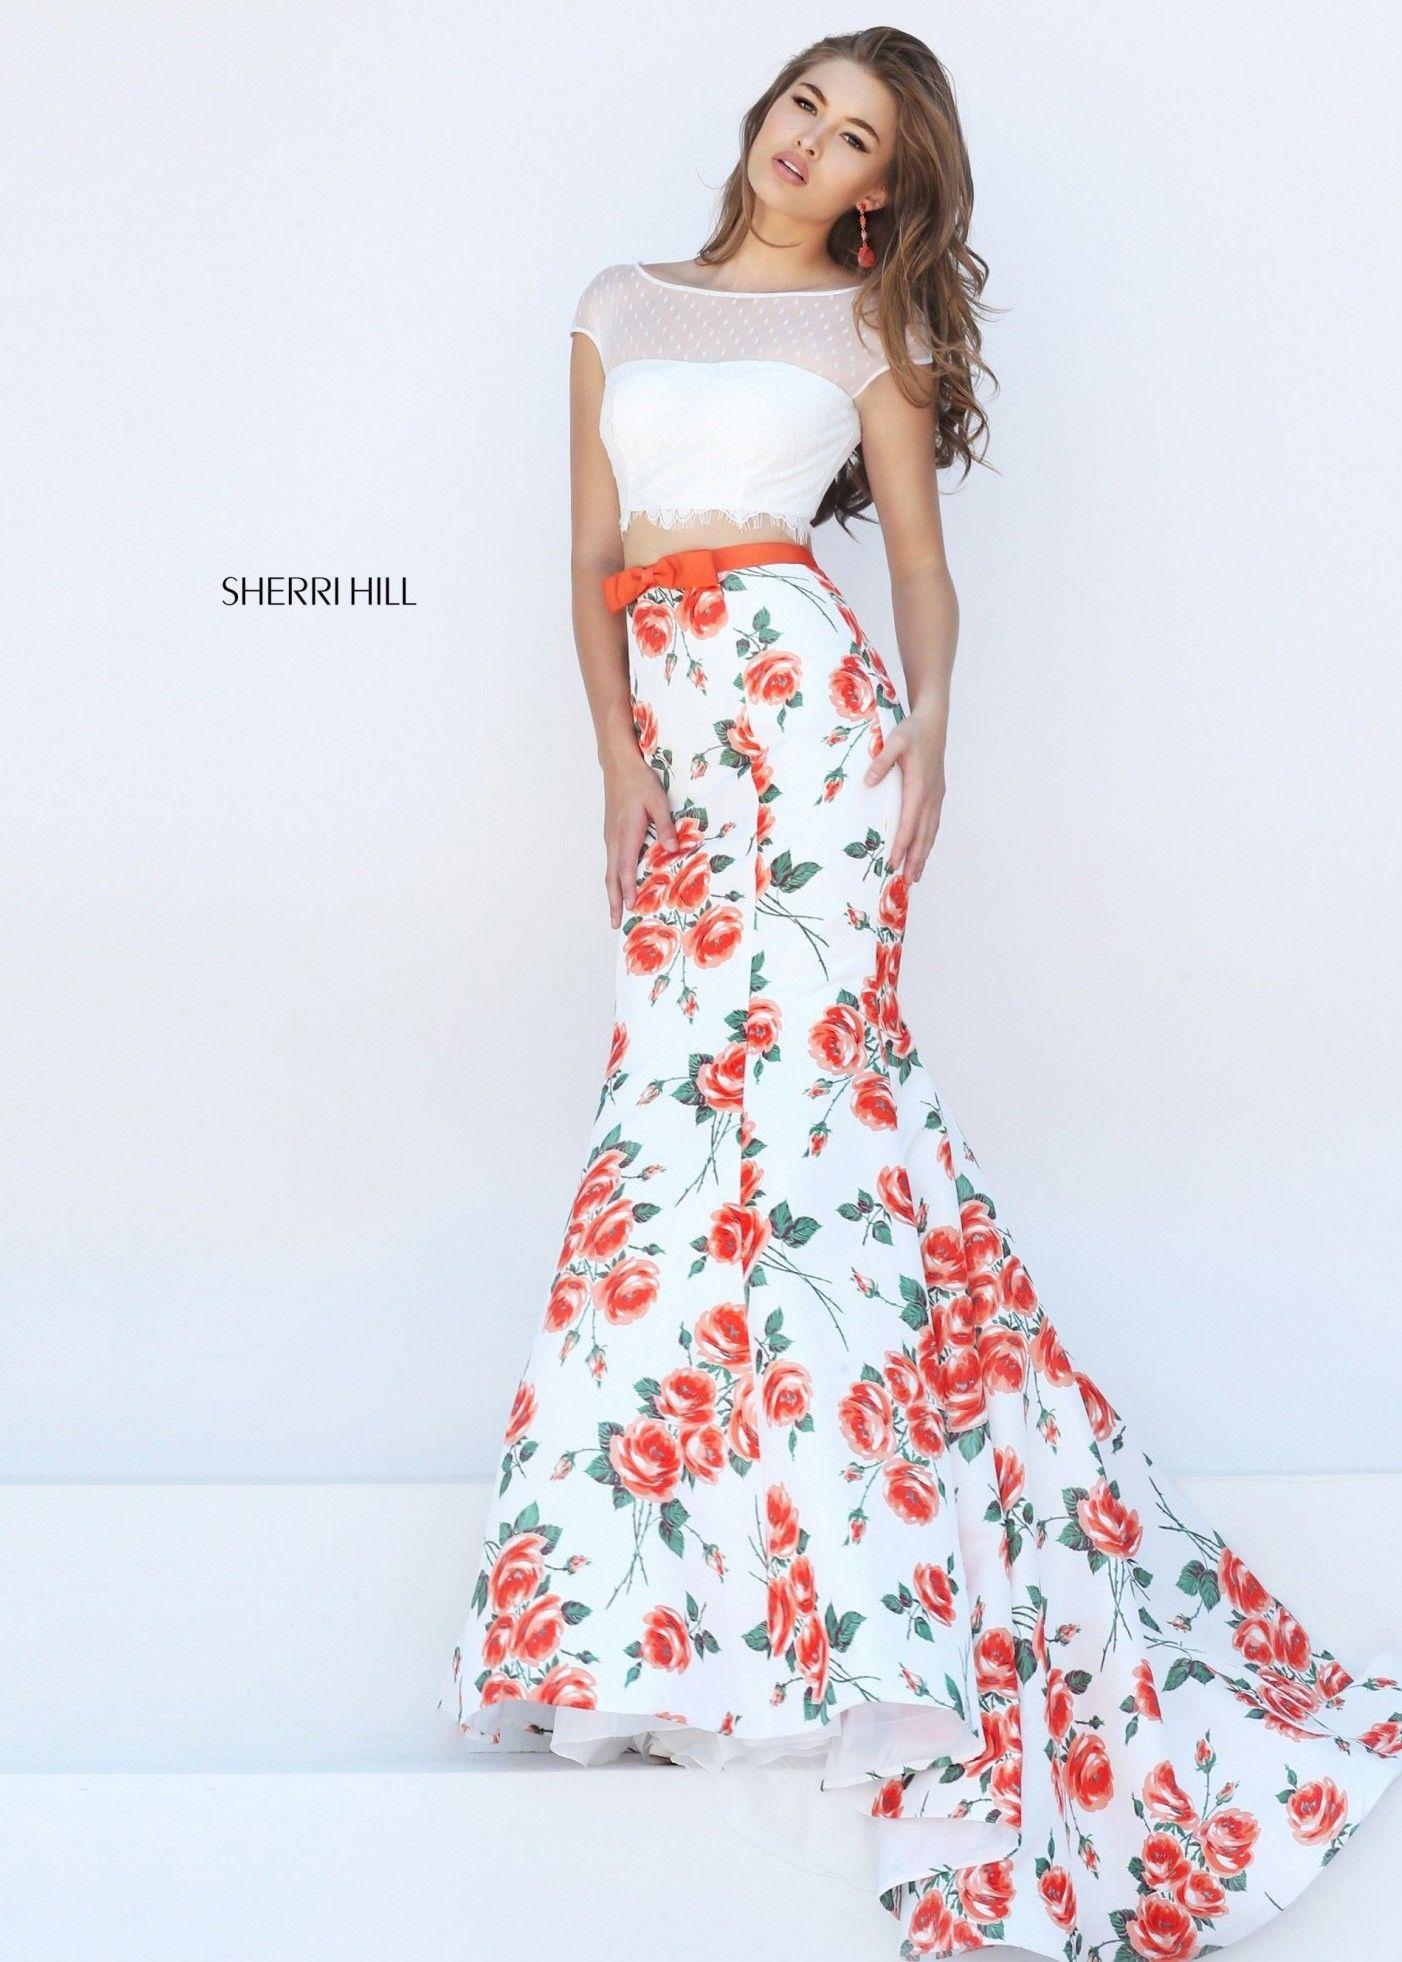 406847dd369 Sherri Hill 50421 Floral Printed Two Piece Mermaid Dress